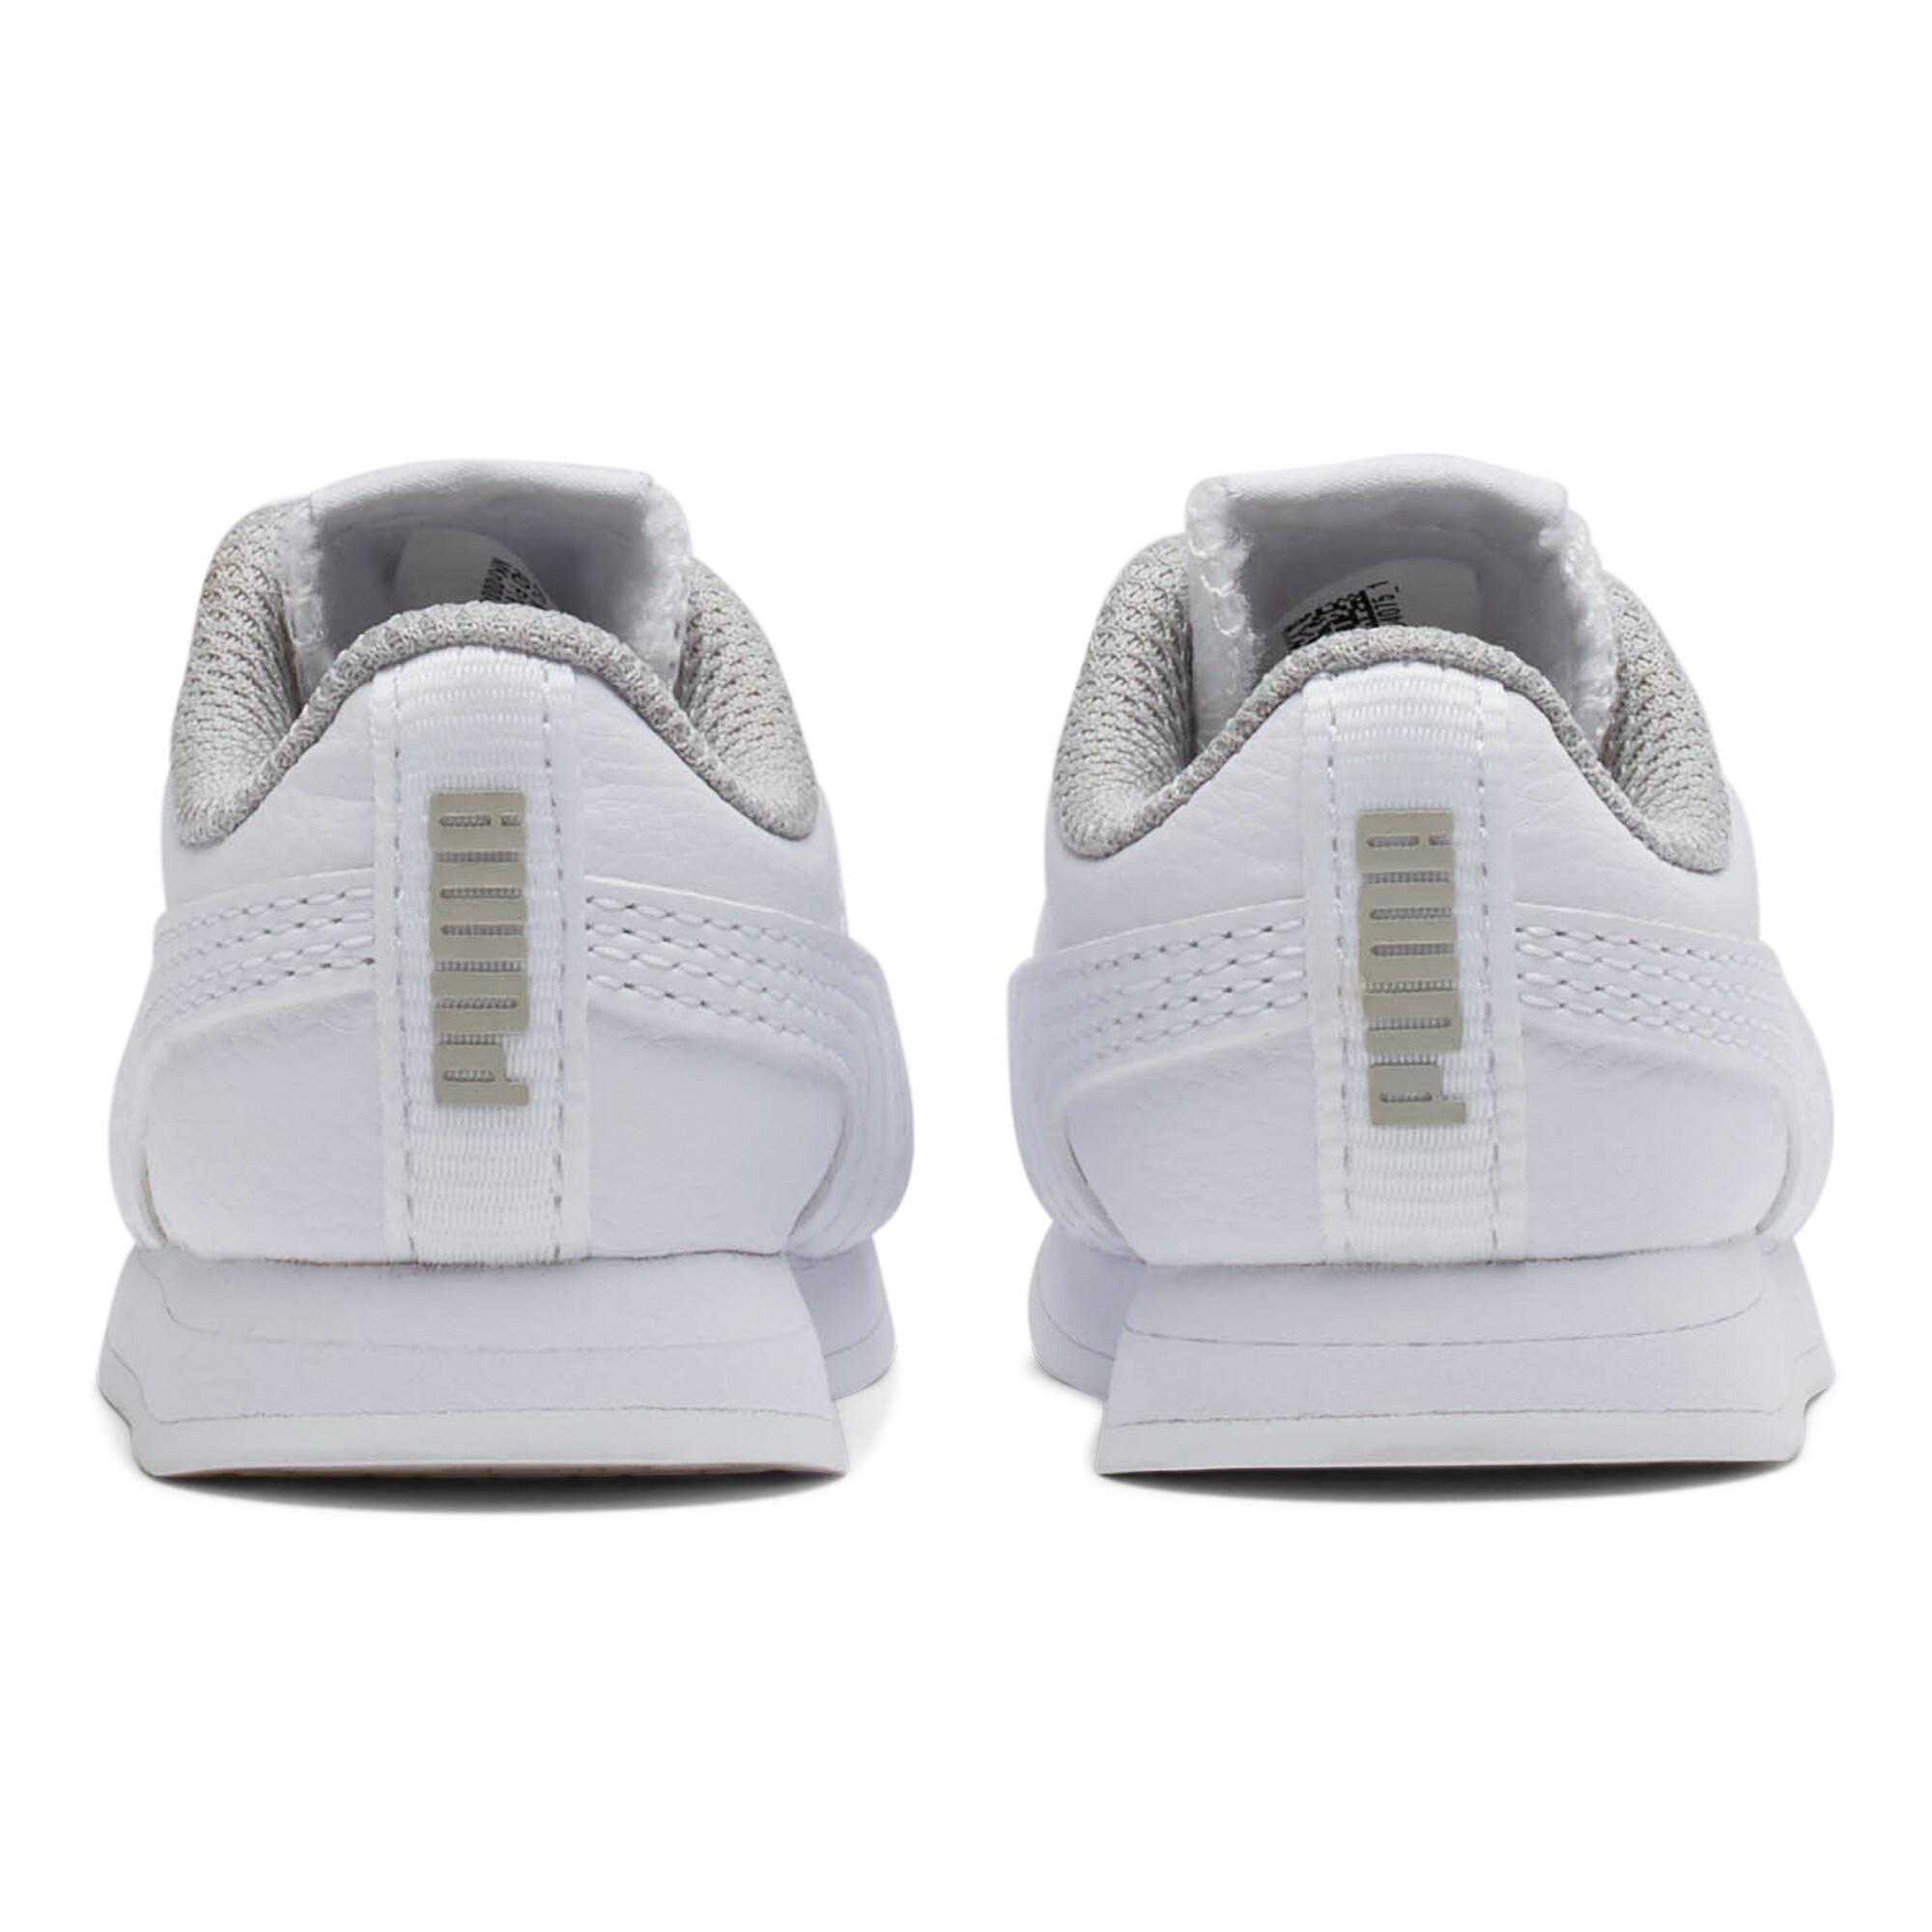 PUMA-Turin-II-AC-Toddler-Shoes-Unisex-Shoe-Kids thumbnail 3